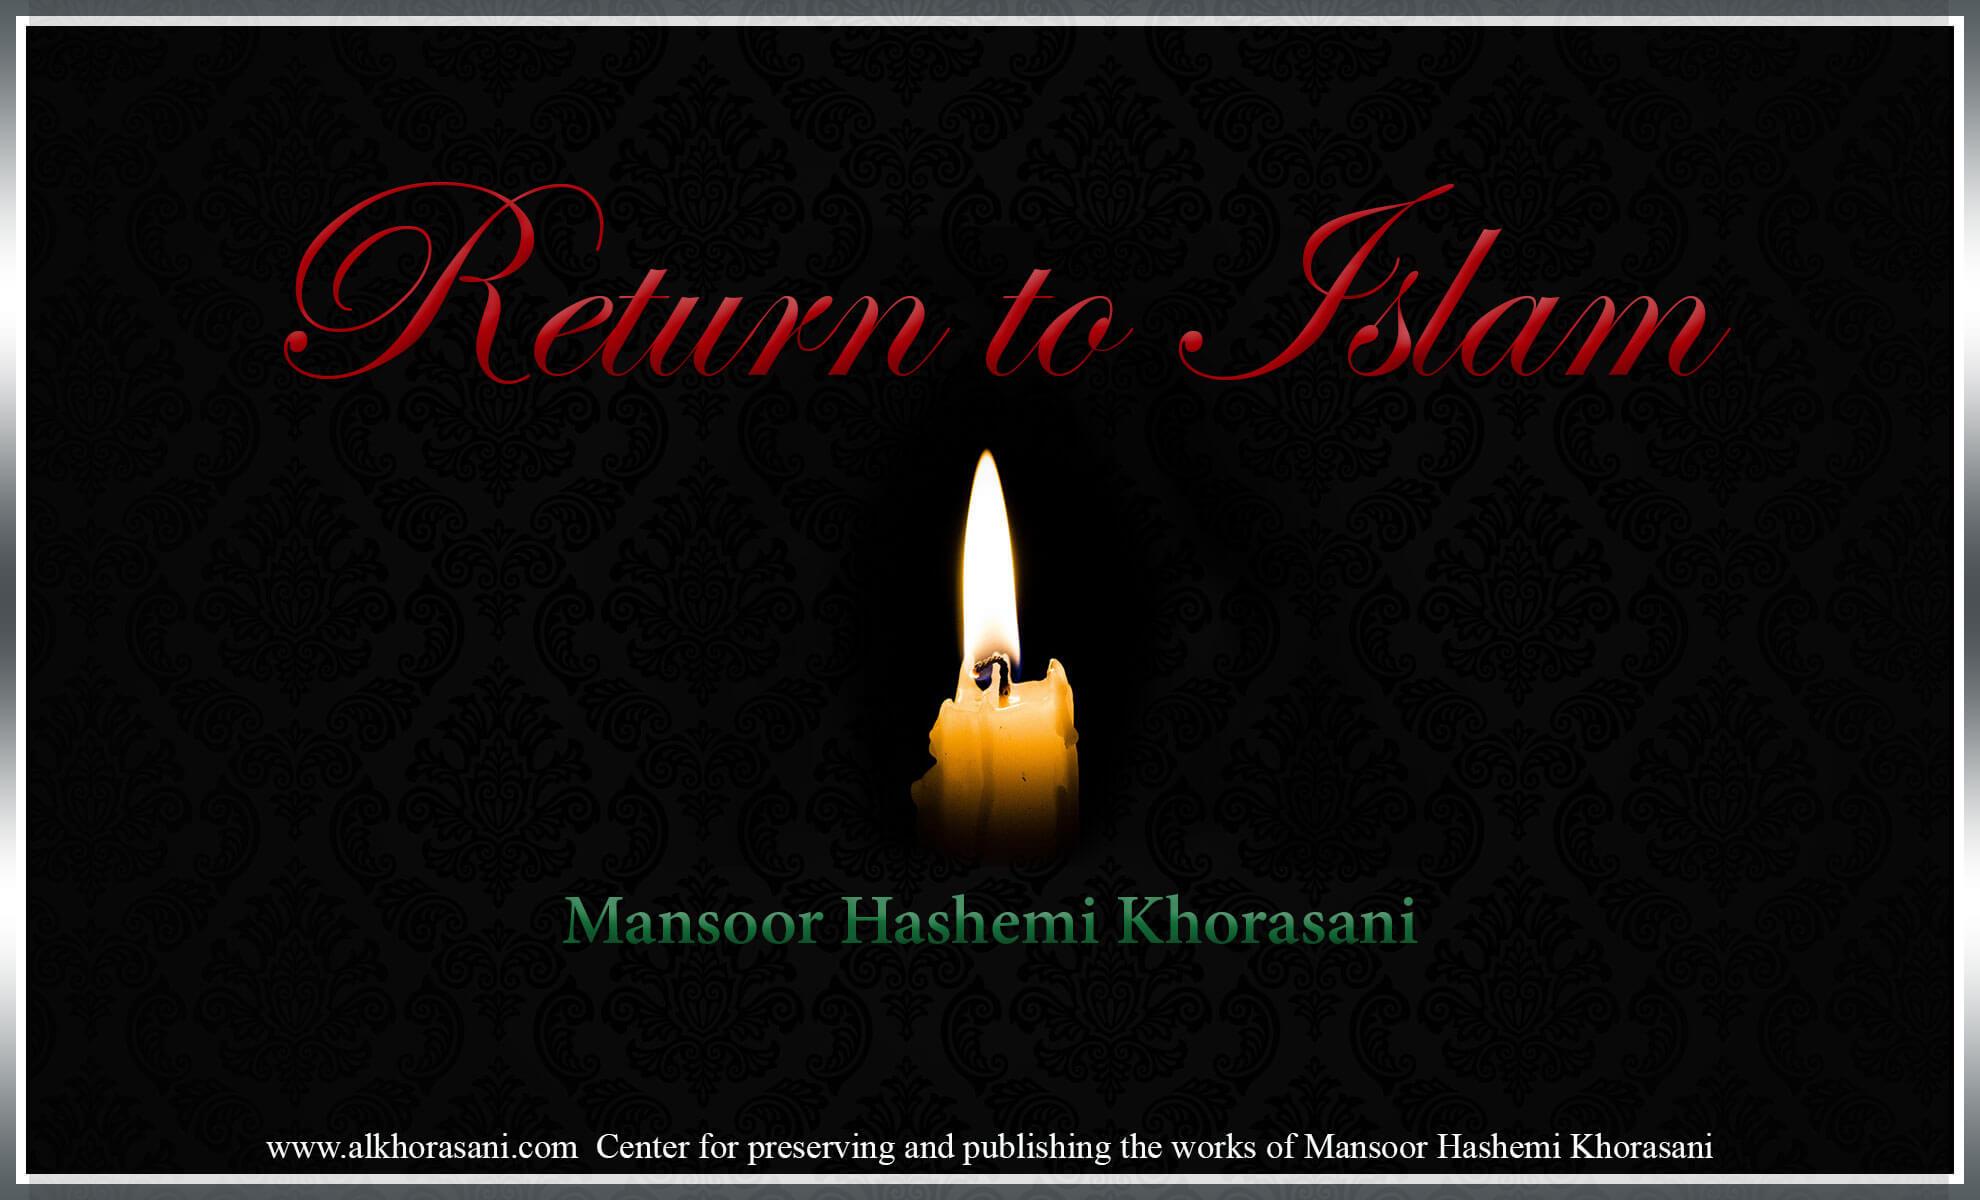 Mansoor Hashemi Khorasani (1)